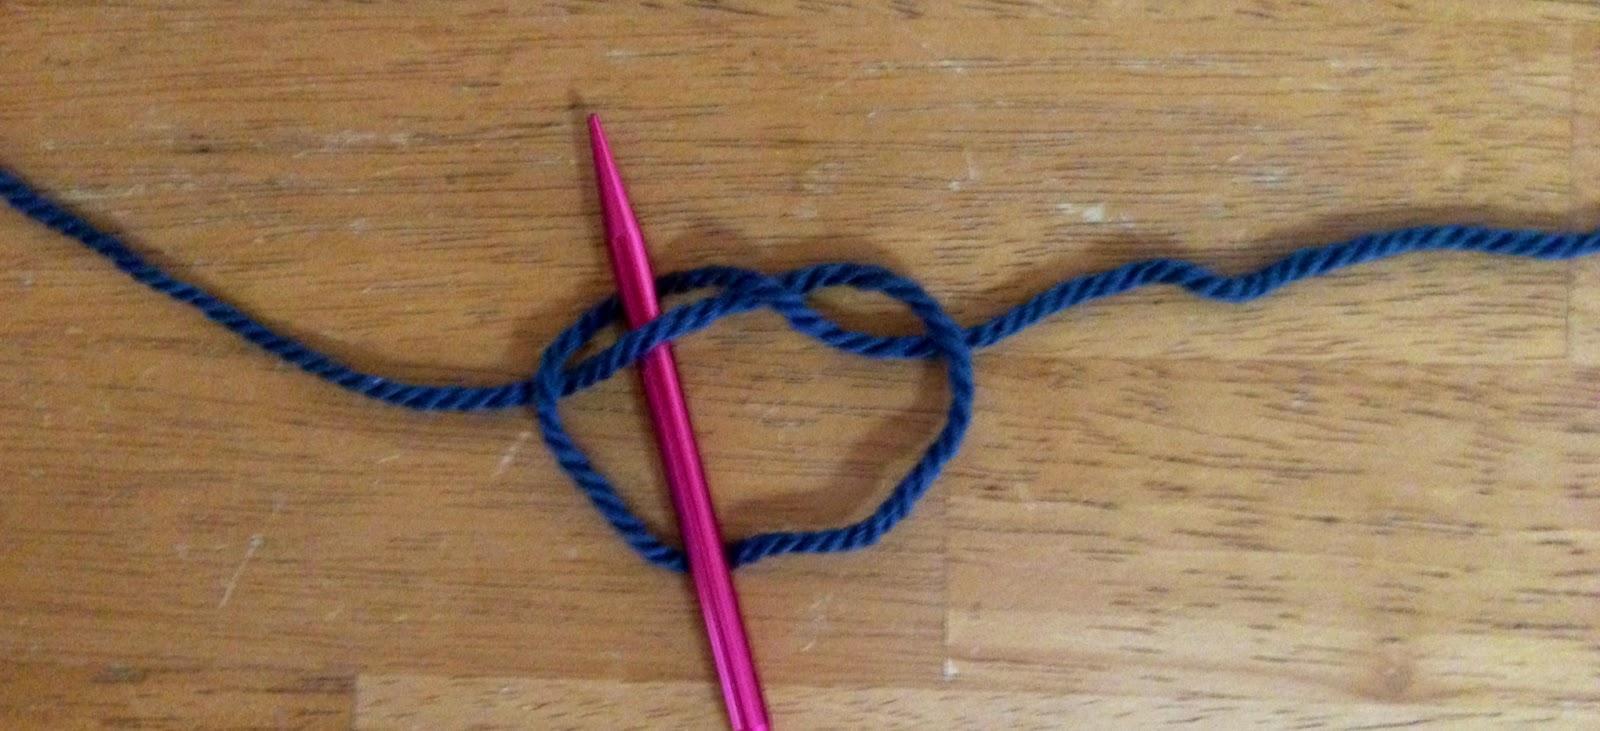 Knitting Stitches Slip Knot : A Flood of Stitches: Knitting basics - How to make a slip knot